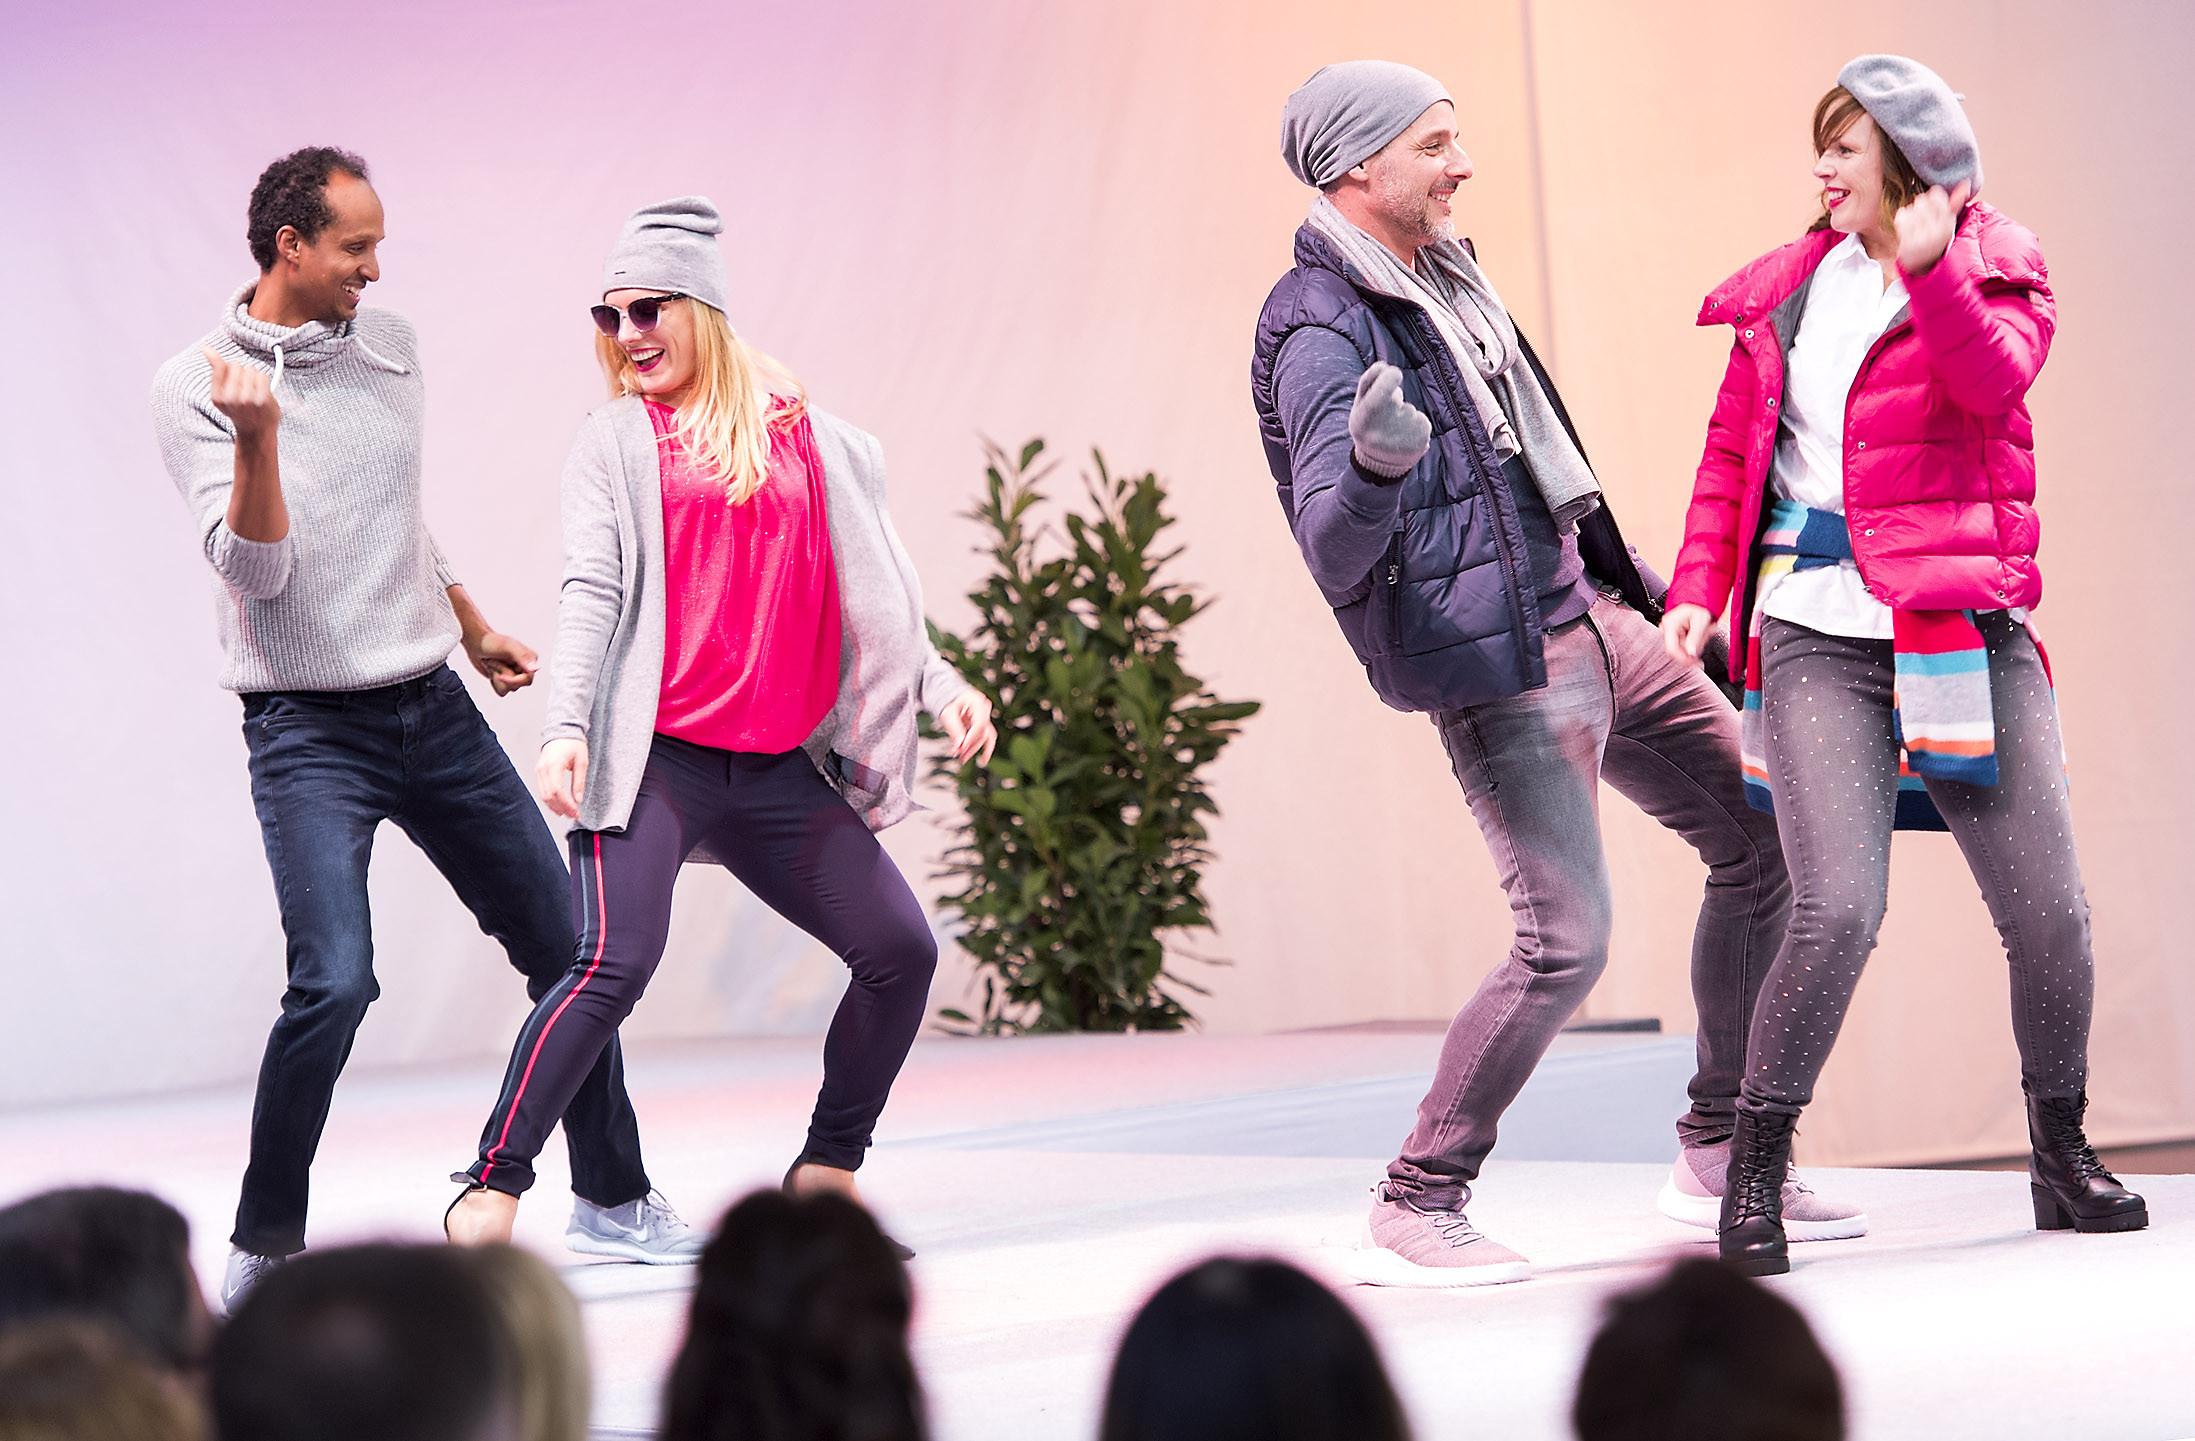 Mode Heim Handwerk 2019  Abschlussbericht NRWs größte Verbrauchermesse Mode Heim